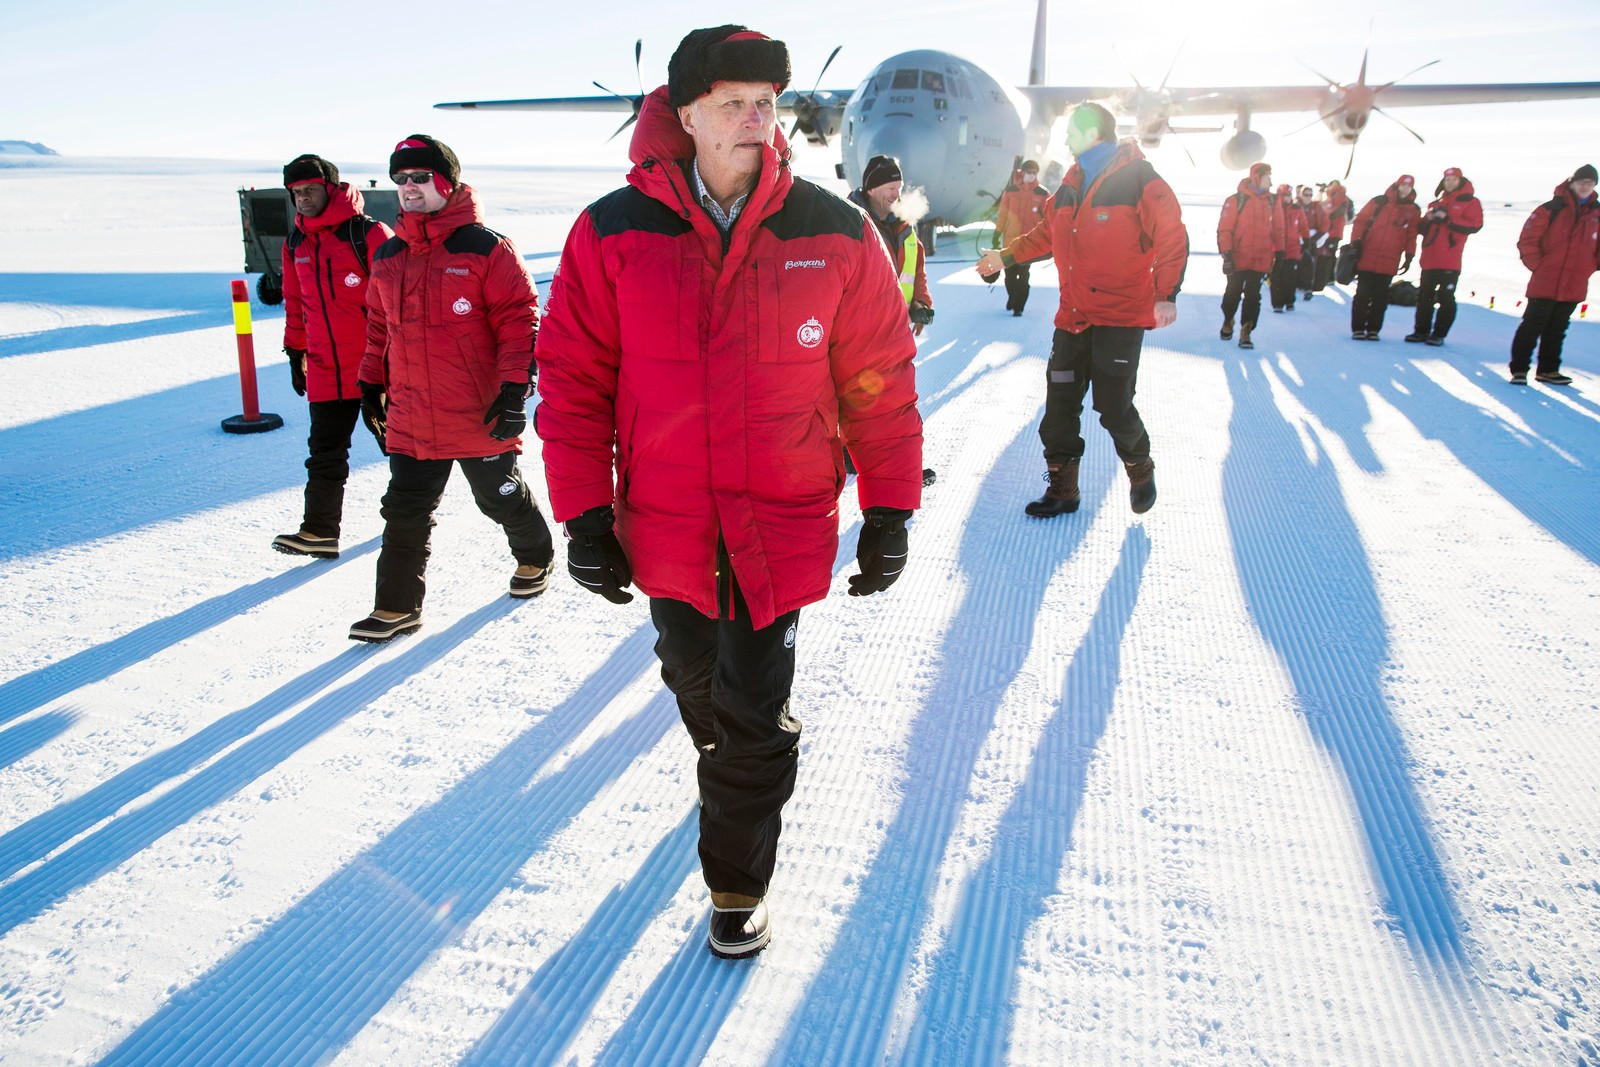 Kong Harald er som første norske konge på besøk i Dronning Maud Land i Antarktis.